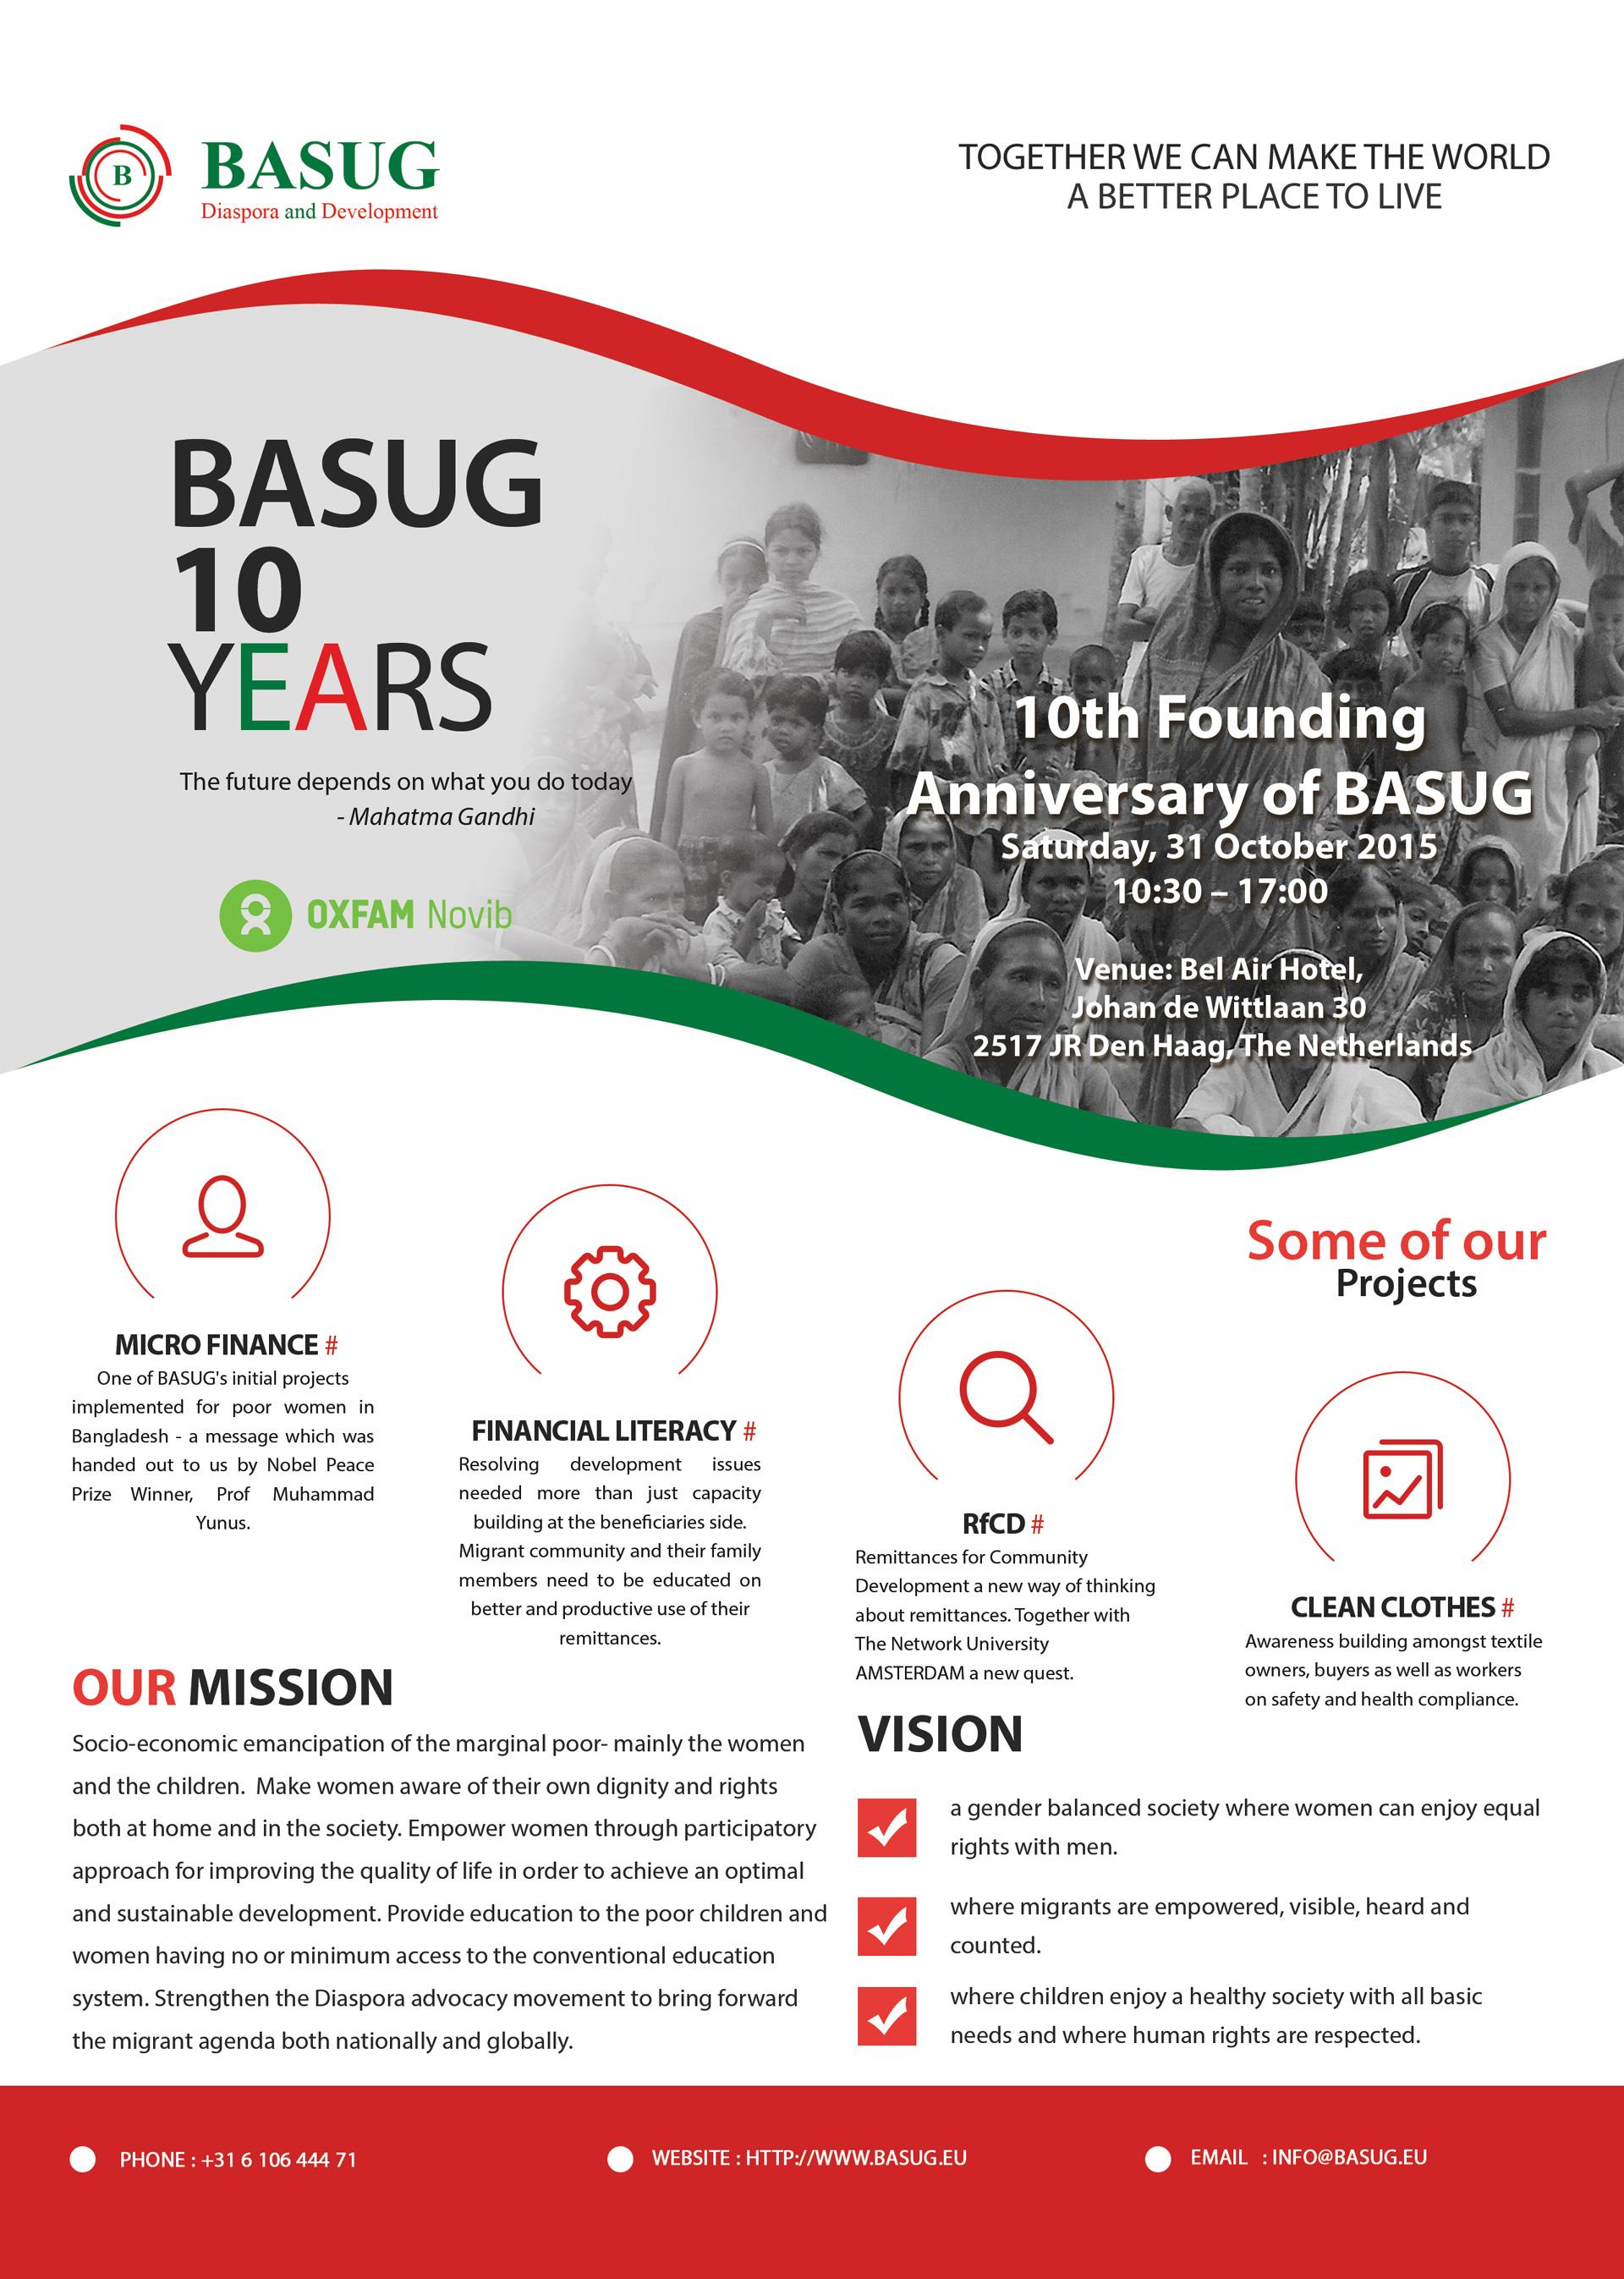 Basug_10years_front_v3